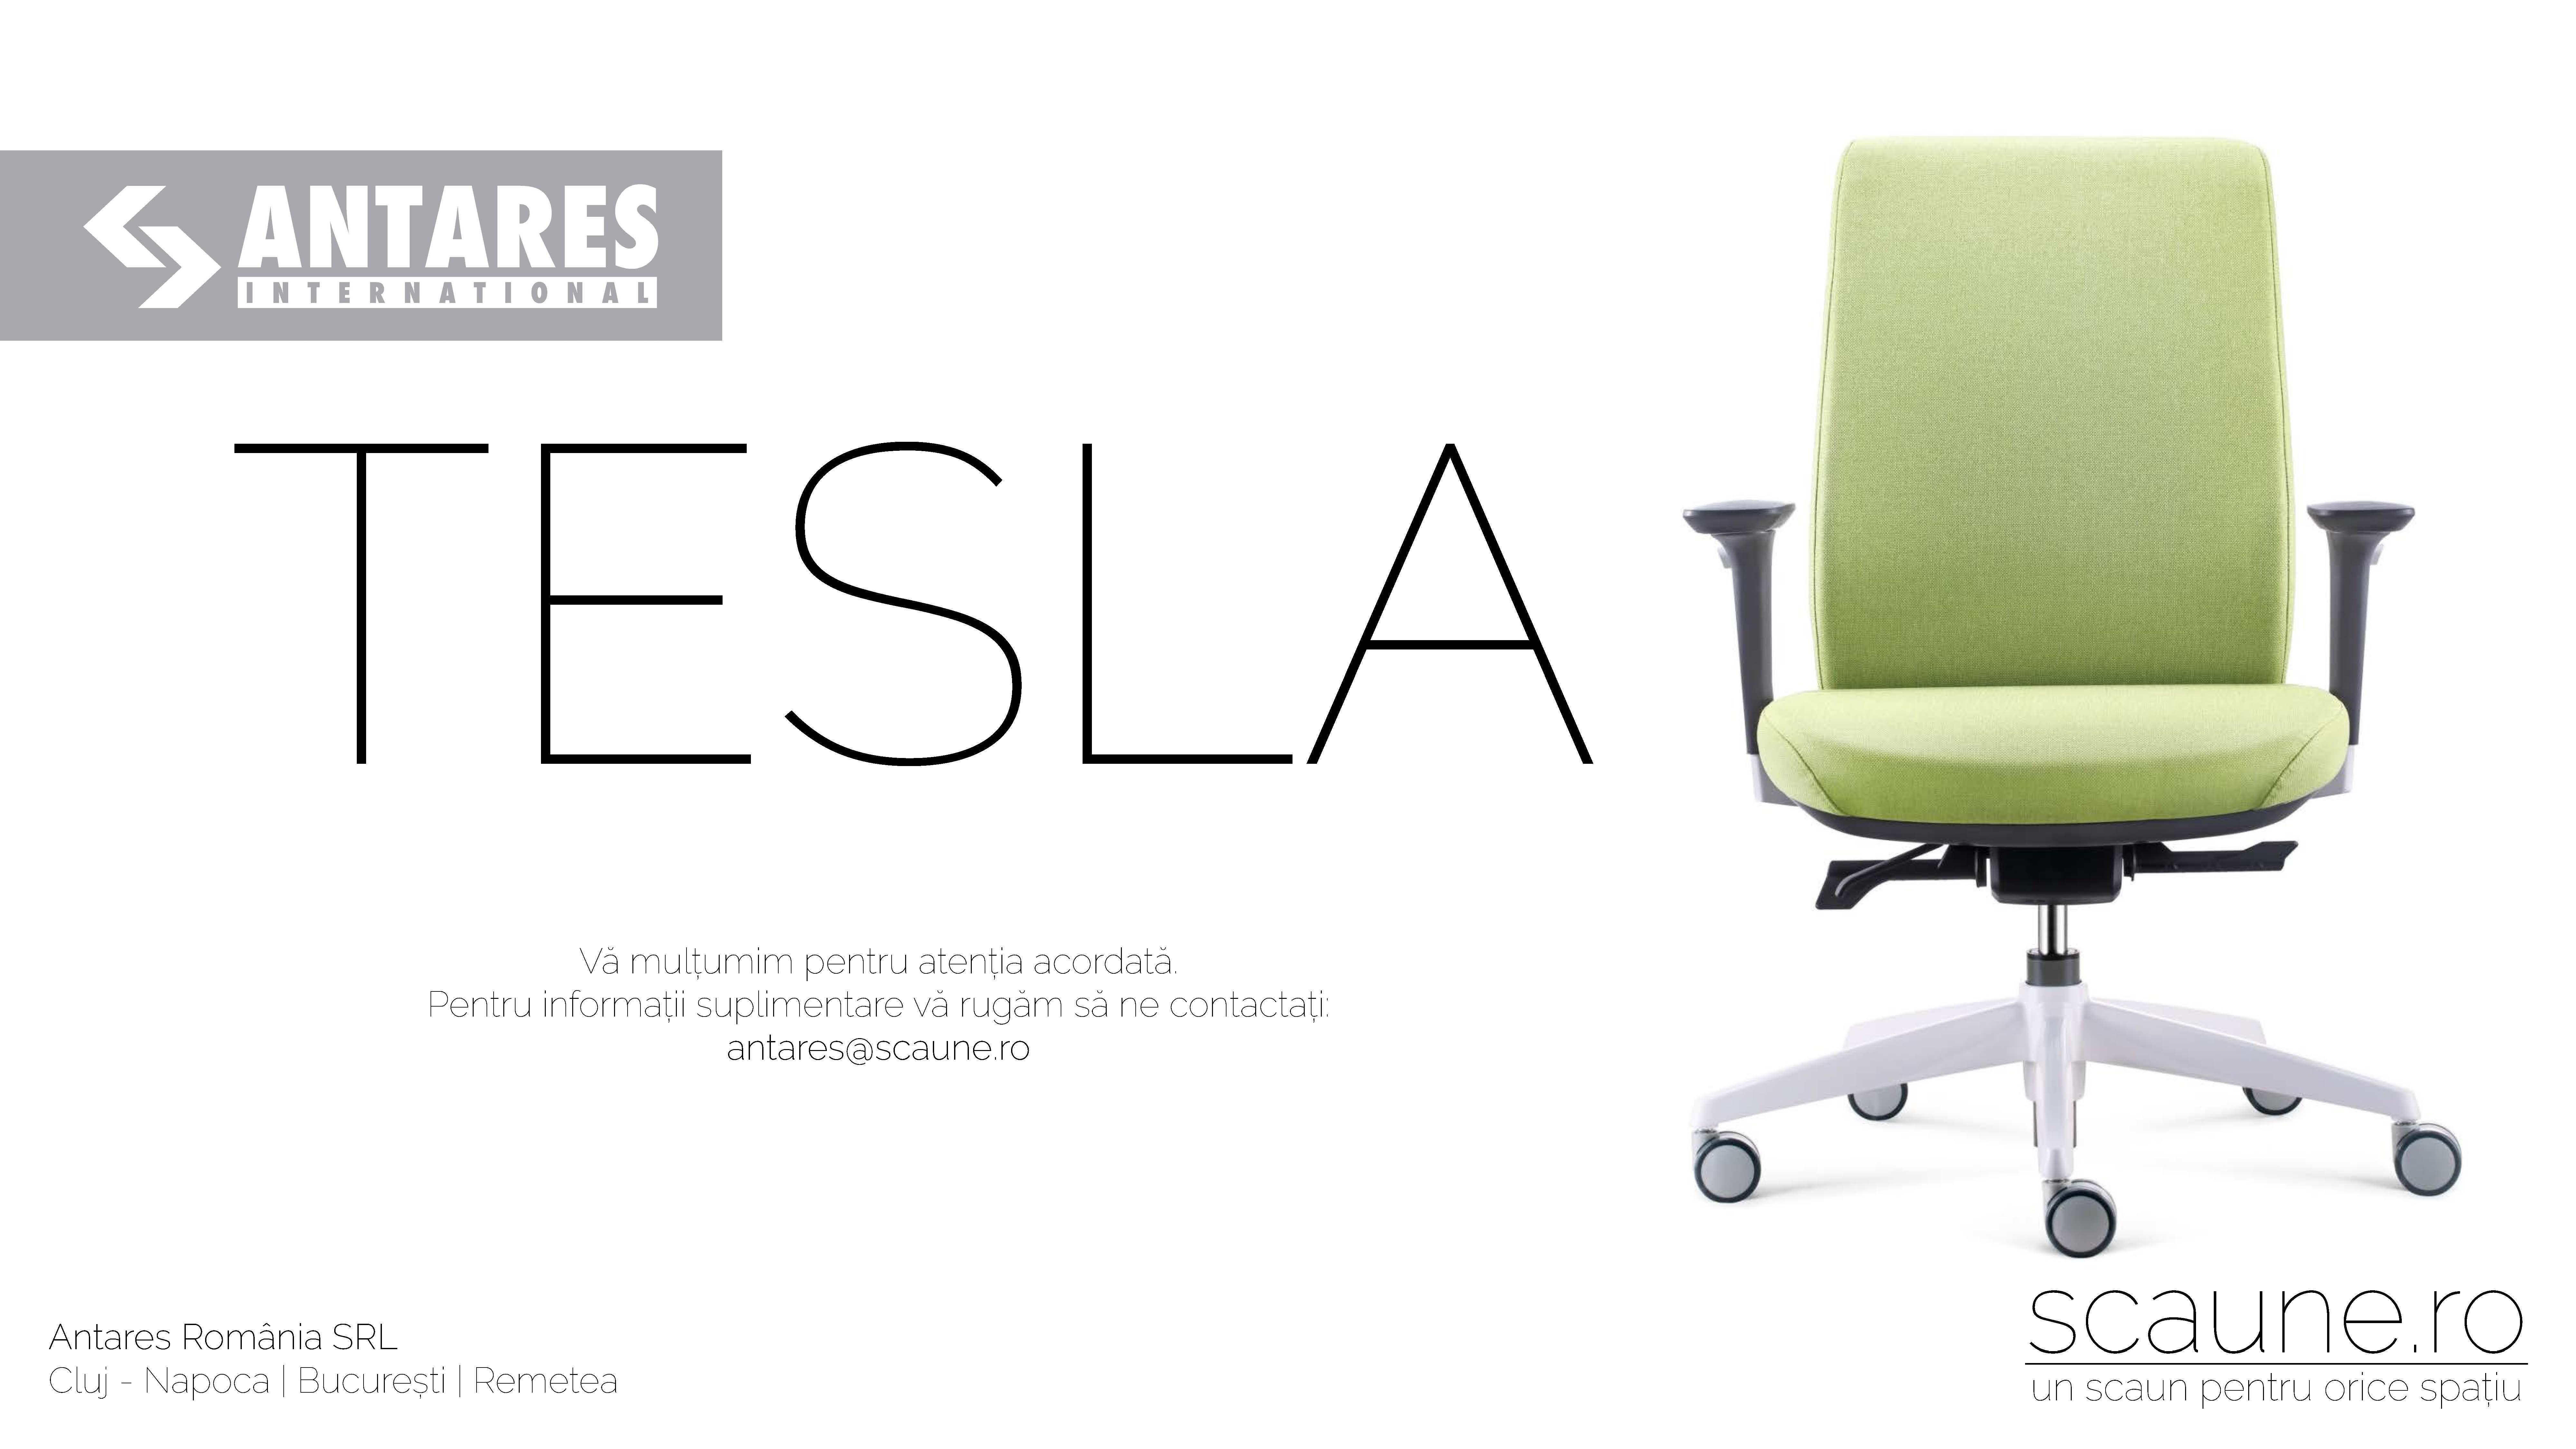 Scaun ergonomic Tesla Antares